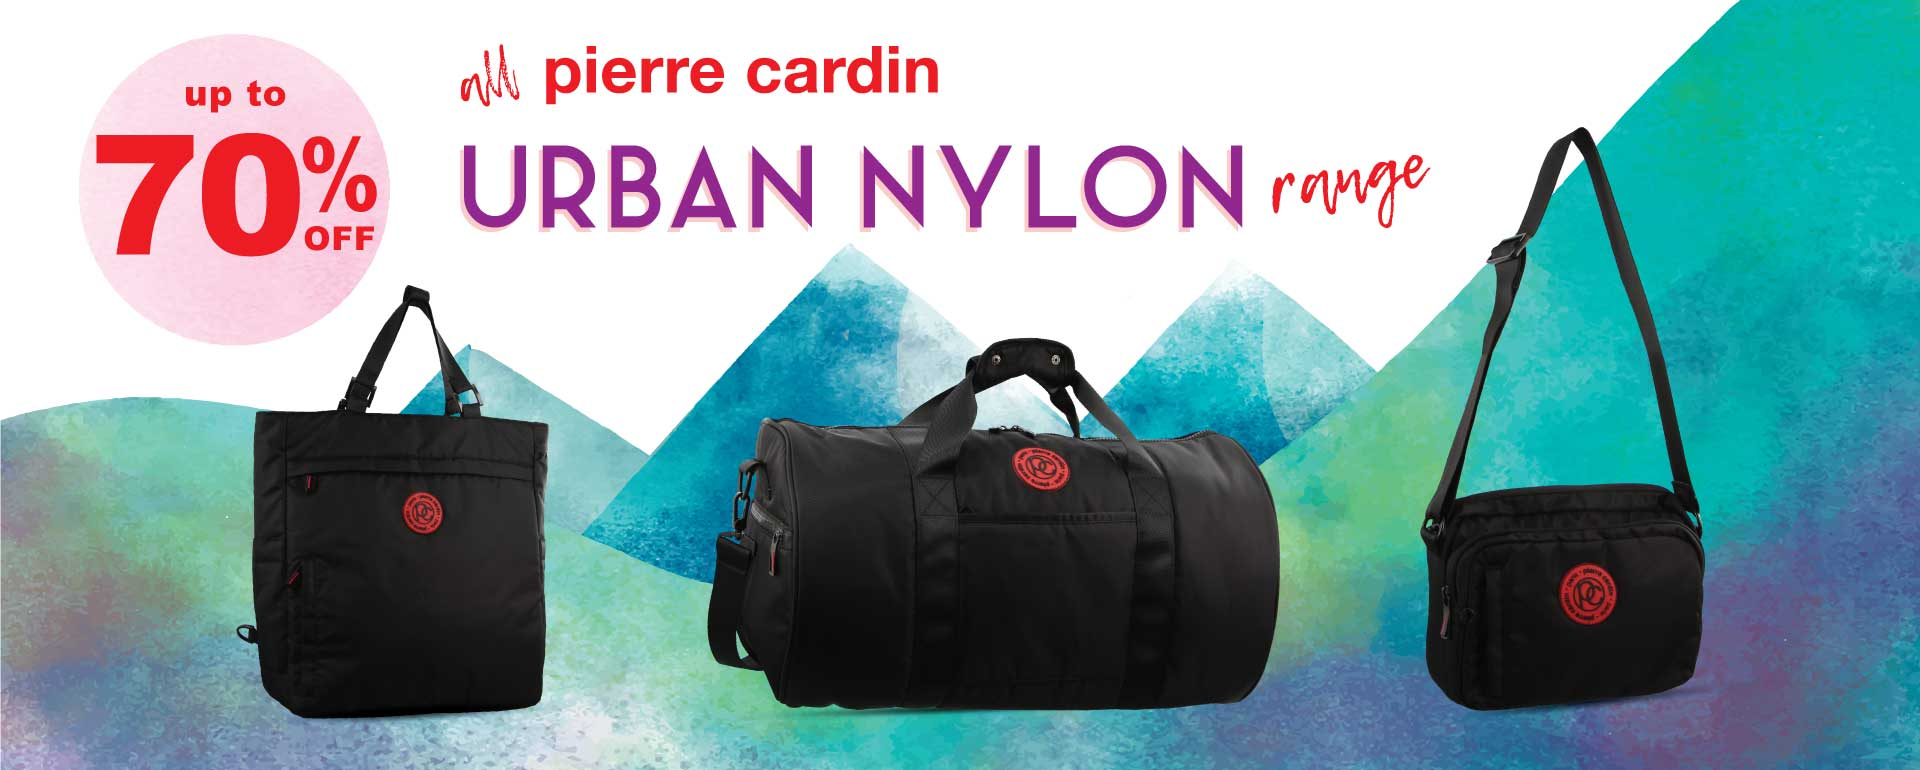 urban-nylon-70-off-banner1.jpg